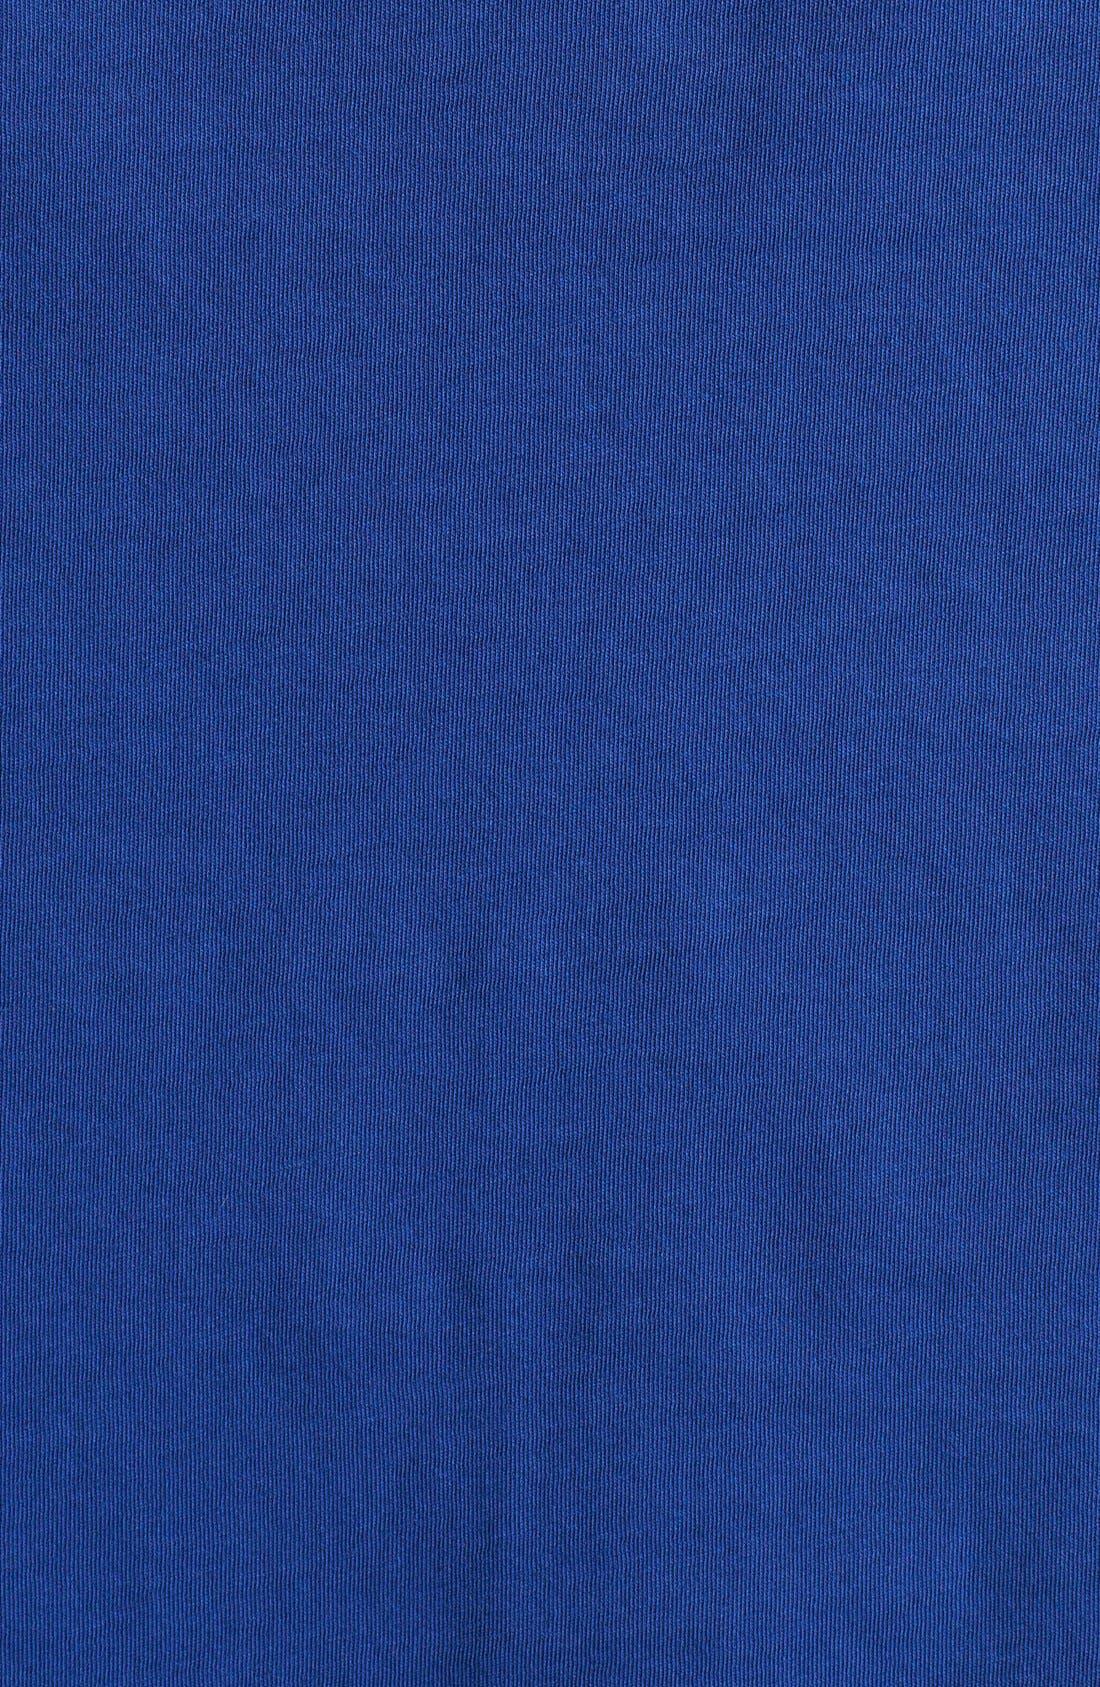 Alternate Image 3  - Burberry Brit 'Campbell' Long Sleeve Henley